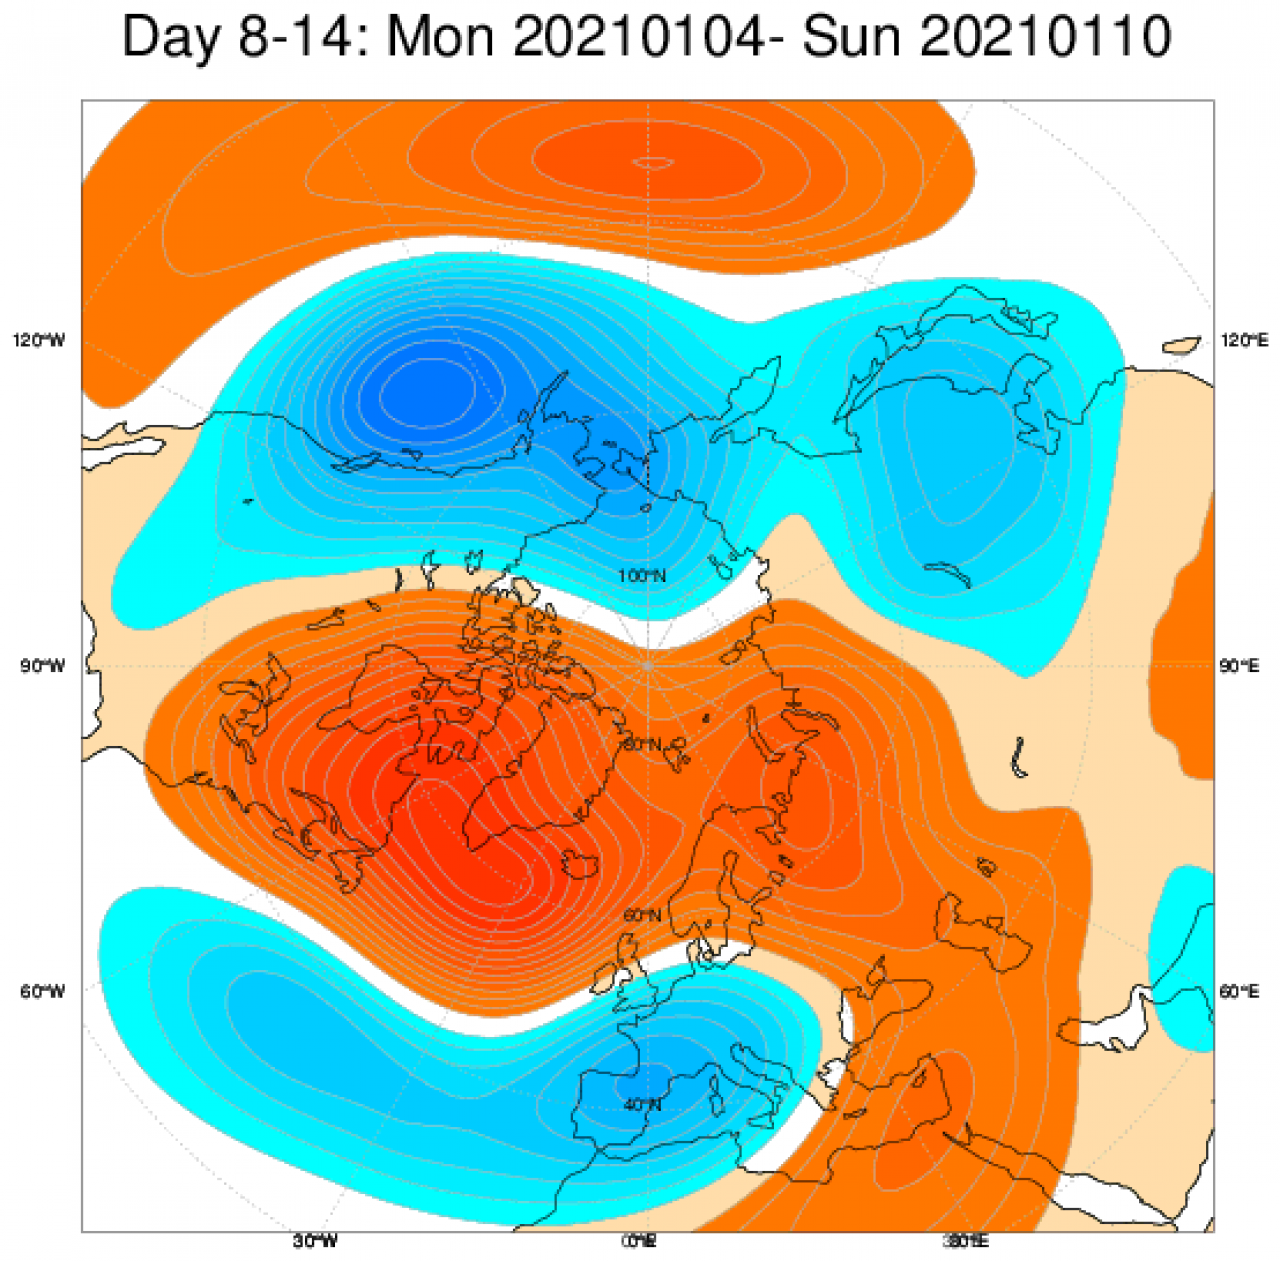 Cartina Meteo Sicilia.Tendenza Meteo Prima Parte Di Gennaio 2021 Instabile O Perturbata 3b Meteo